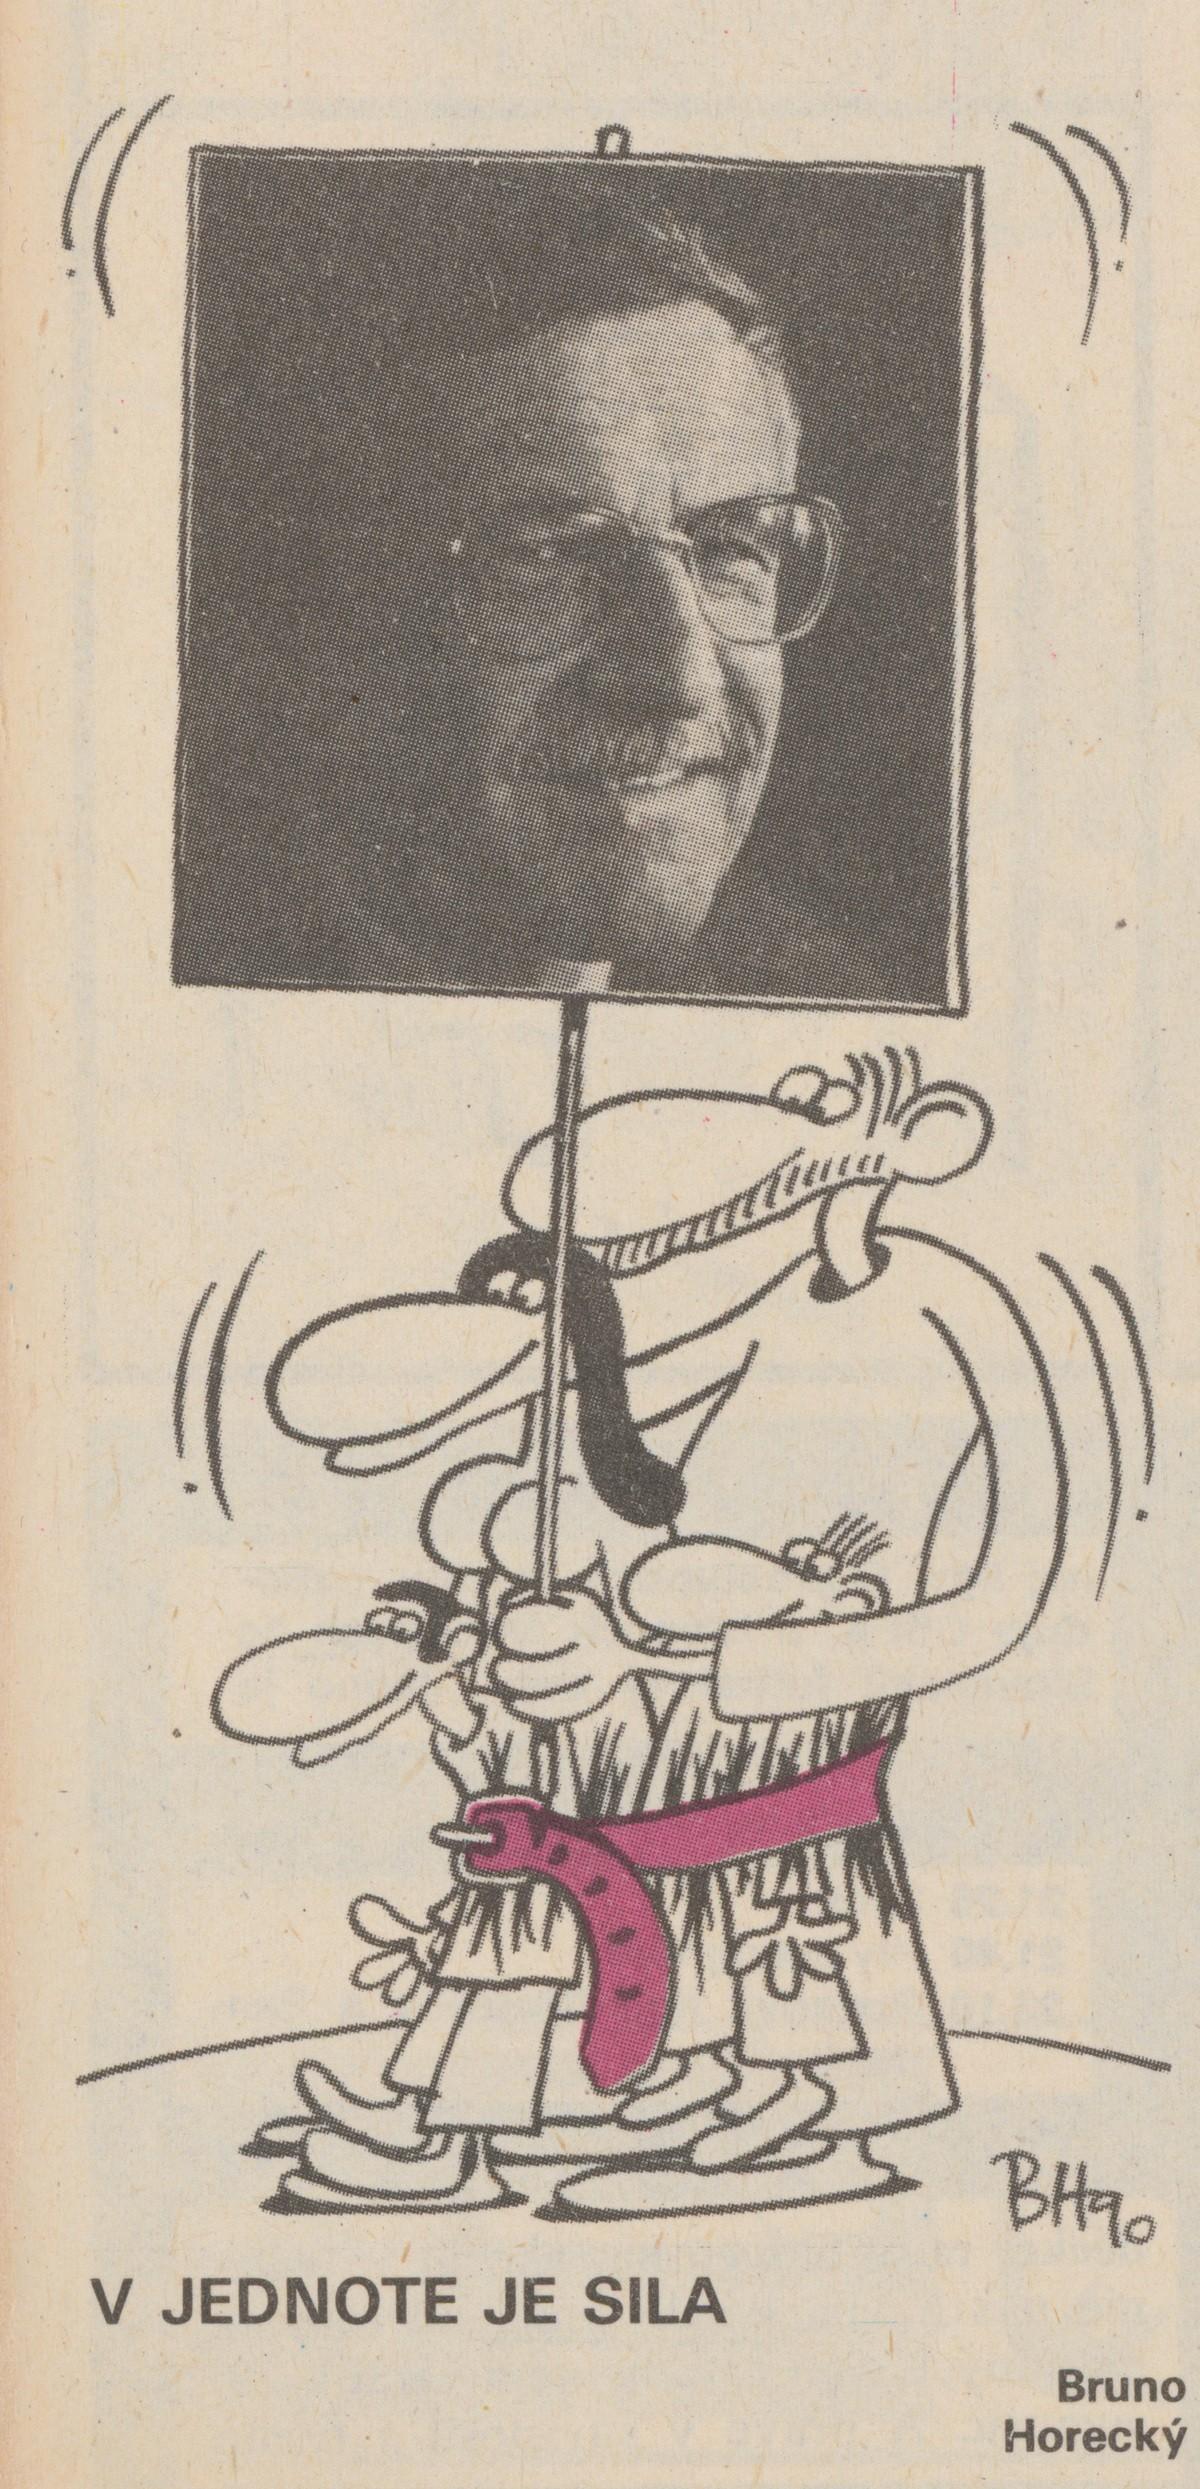 Bruno Horecký, V jednote je sila. 1990. Časopis Roháč